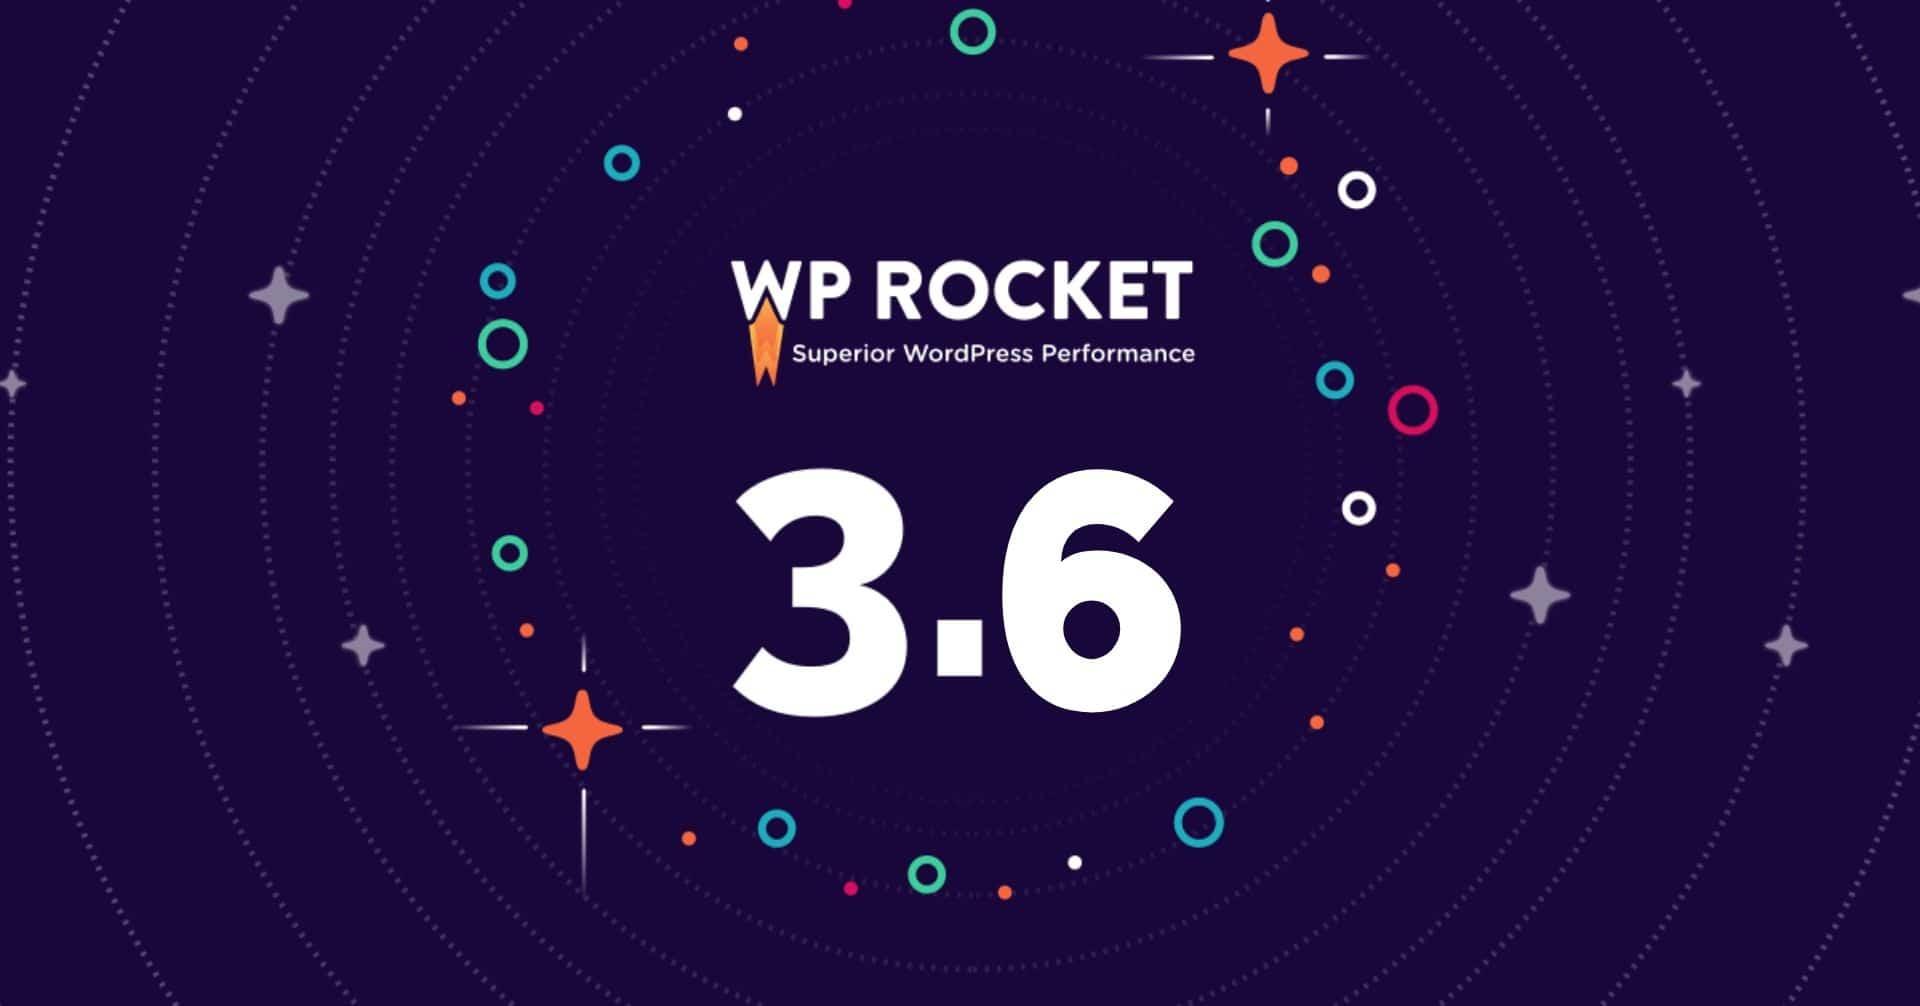 WP Rocket v3.6